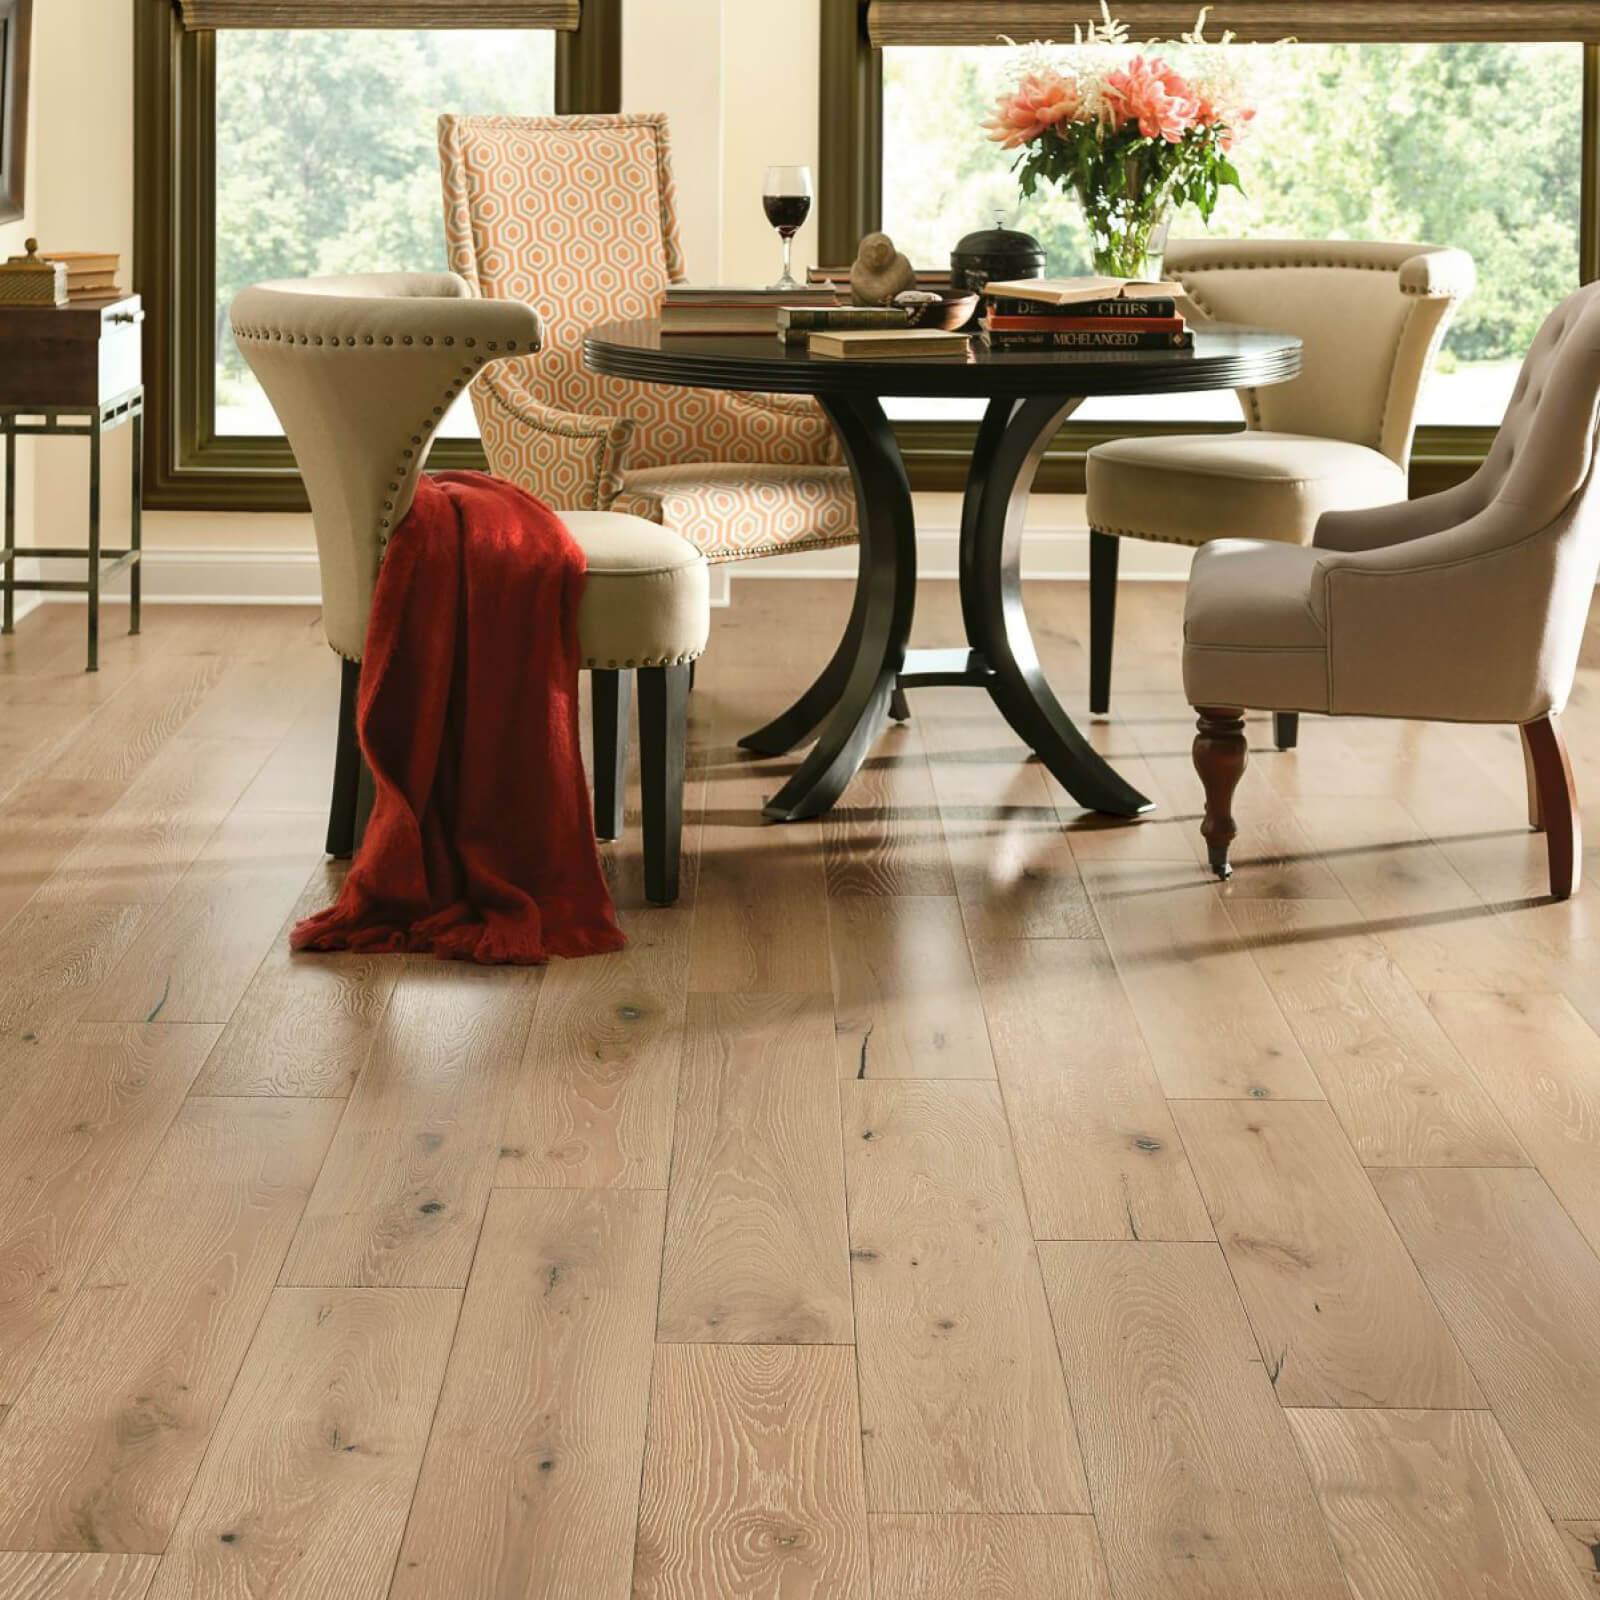 Hickory Hardwood Flooring | Dalton Flooring Outlet